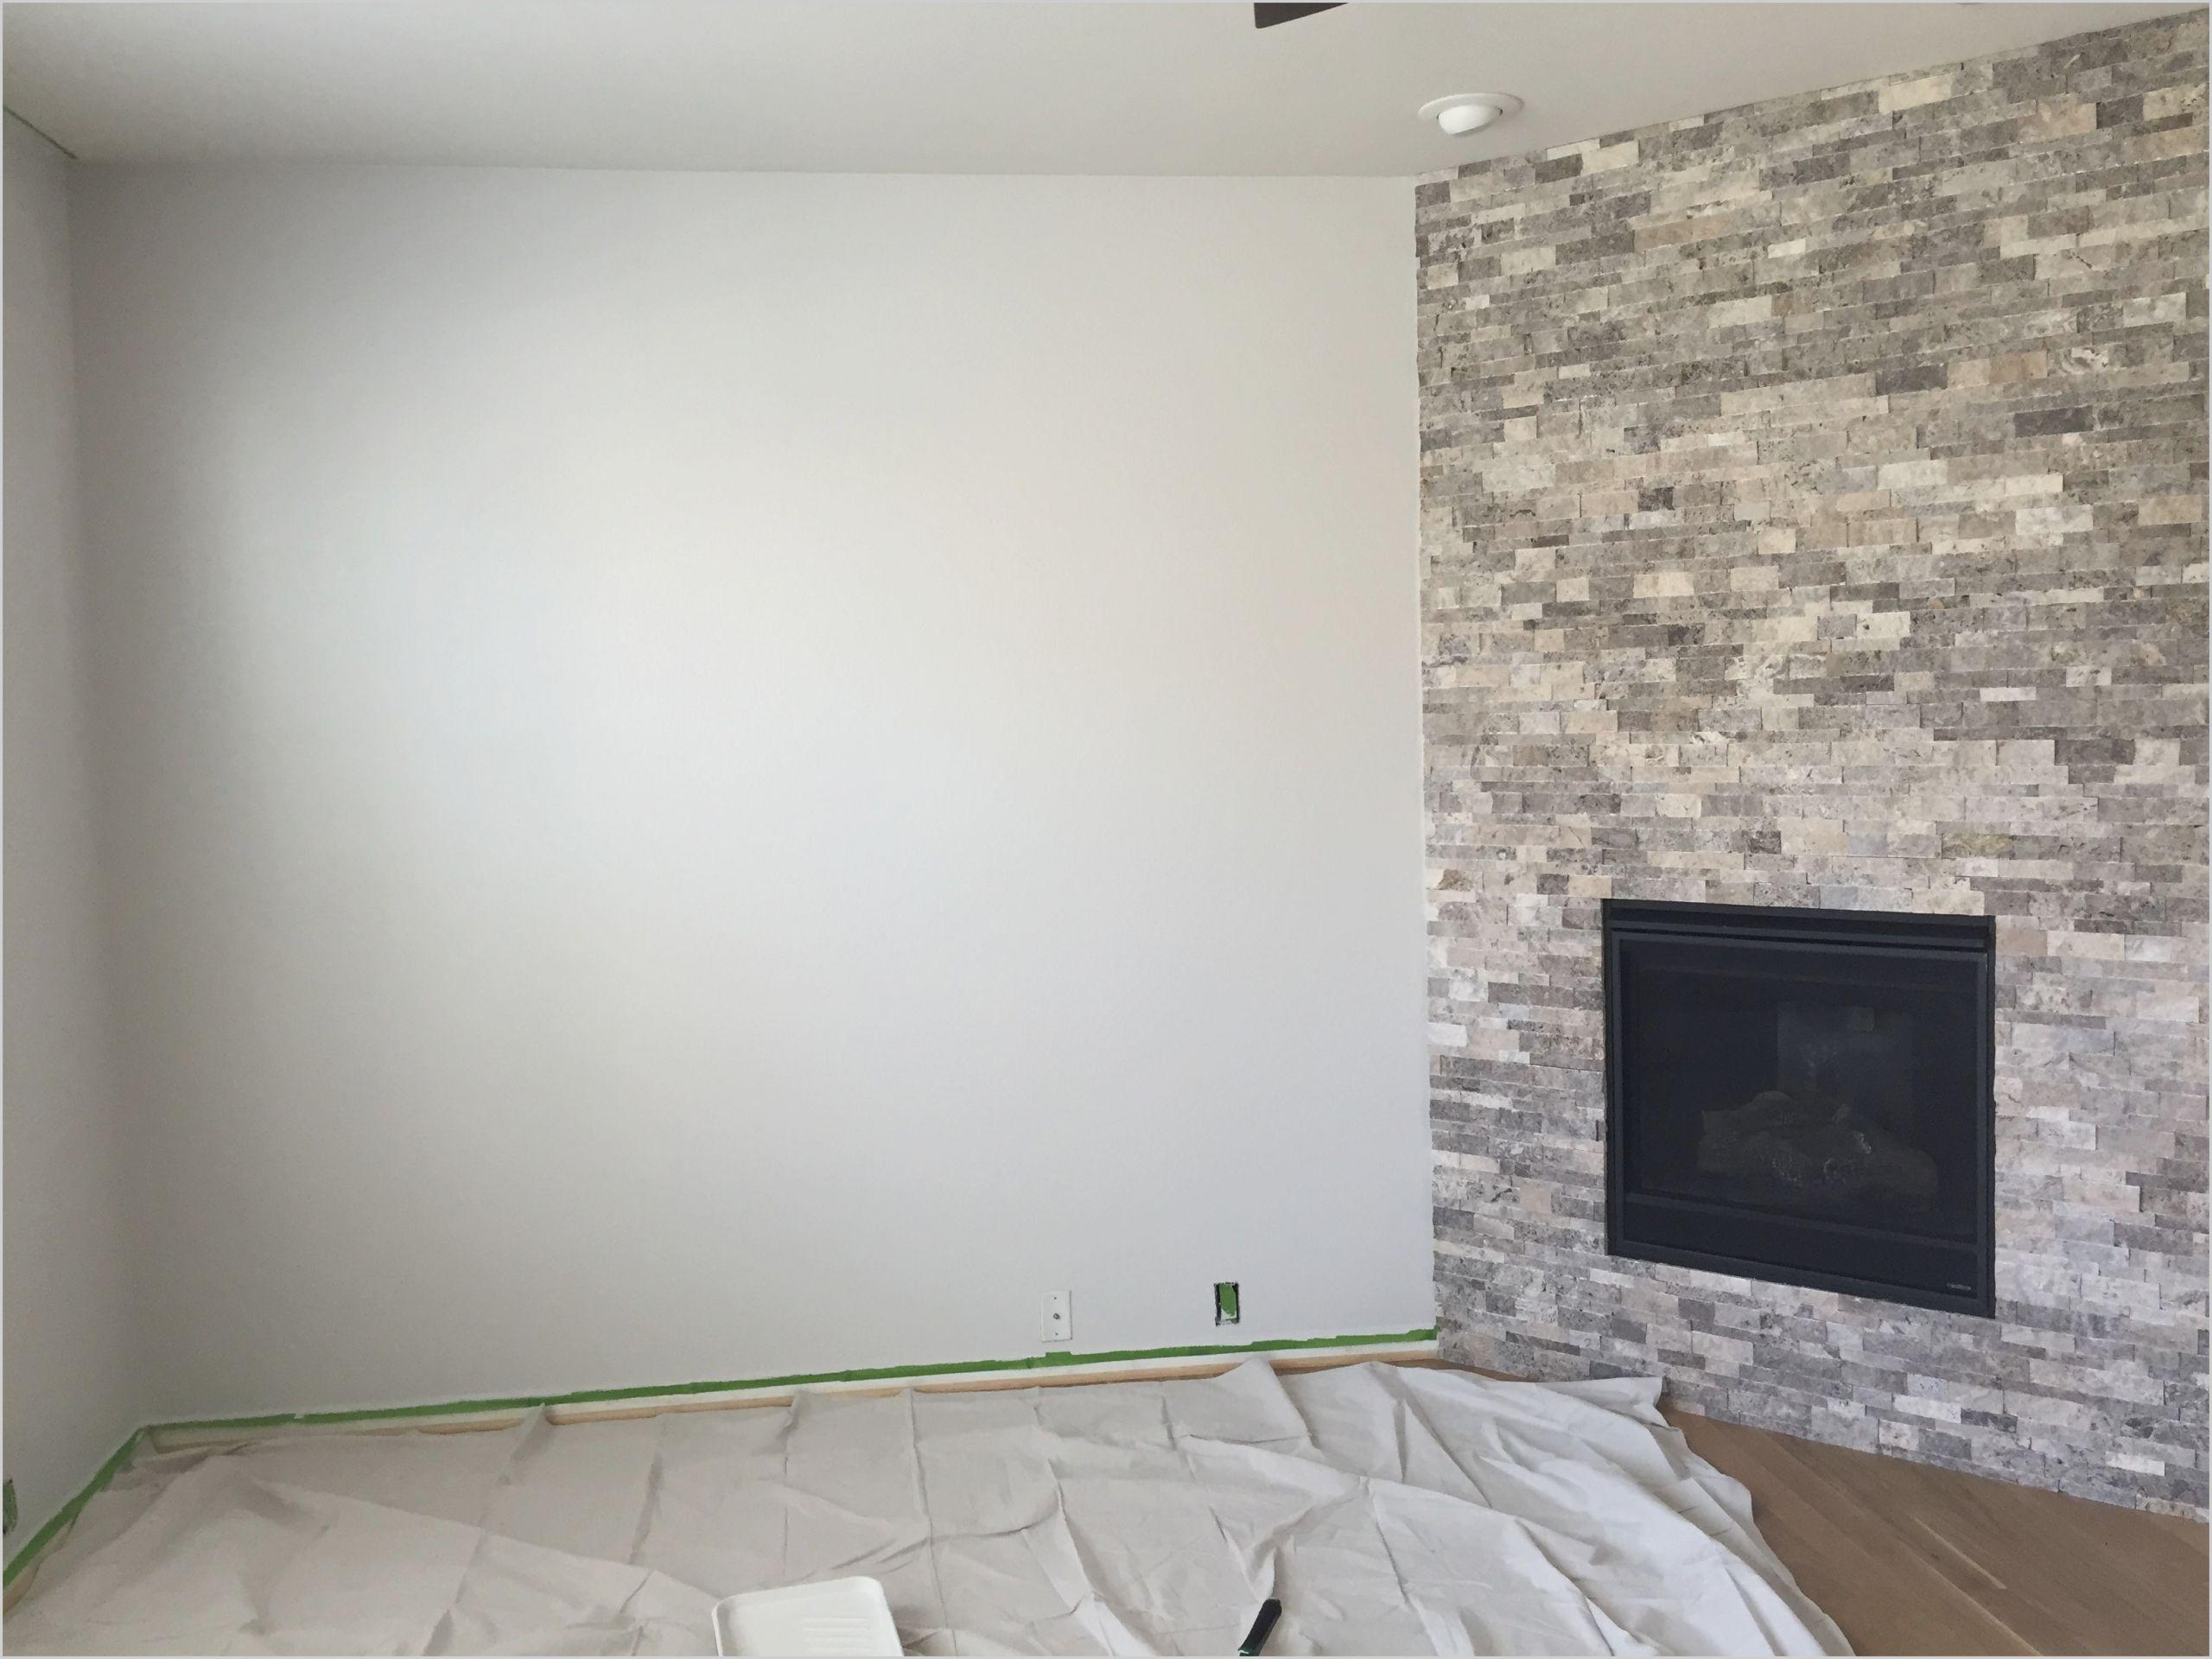 Paint Sheen for Living Room Walls Behr di 2020